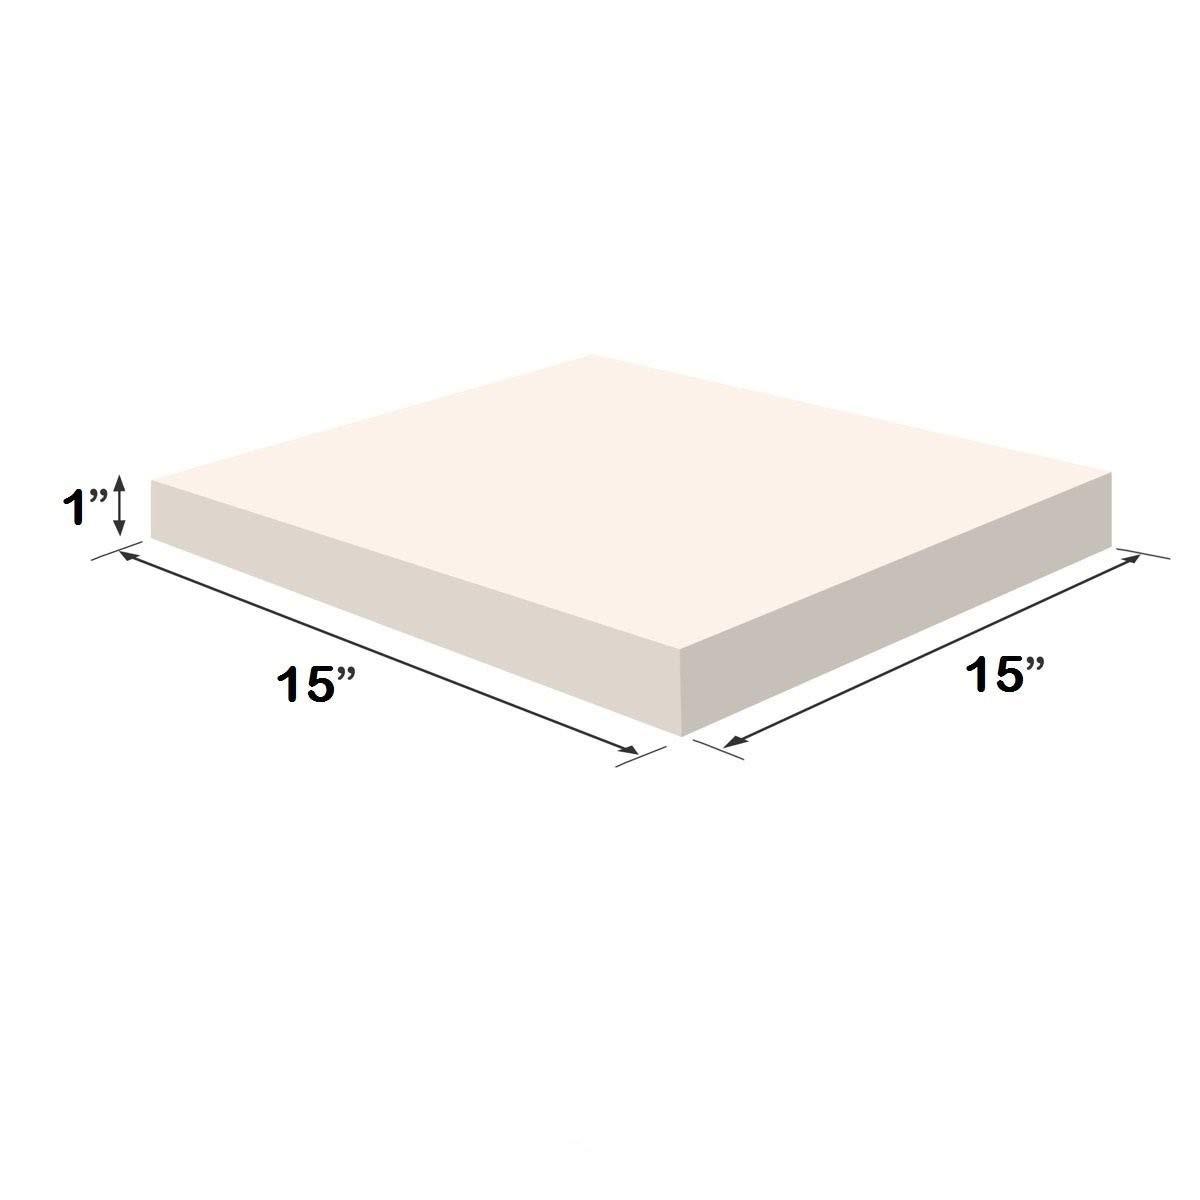 FOAMMA 1 x 18 x 18 Upholstery Foam High Density Foam Chair Cushion Square Foam for Dinning Chairs, Wheelchair Seat Cushion Replacement